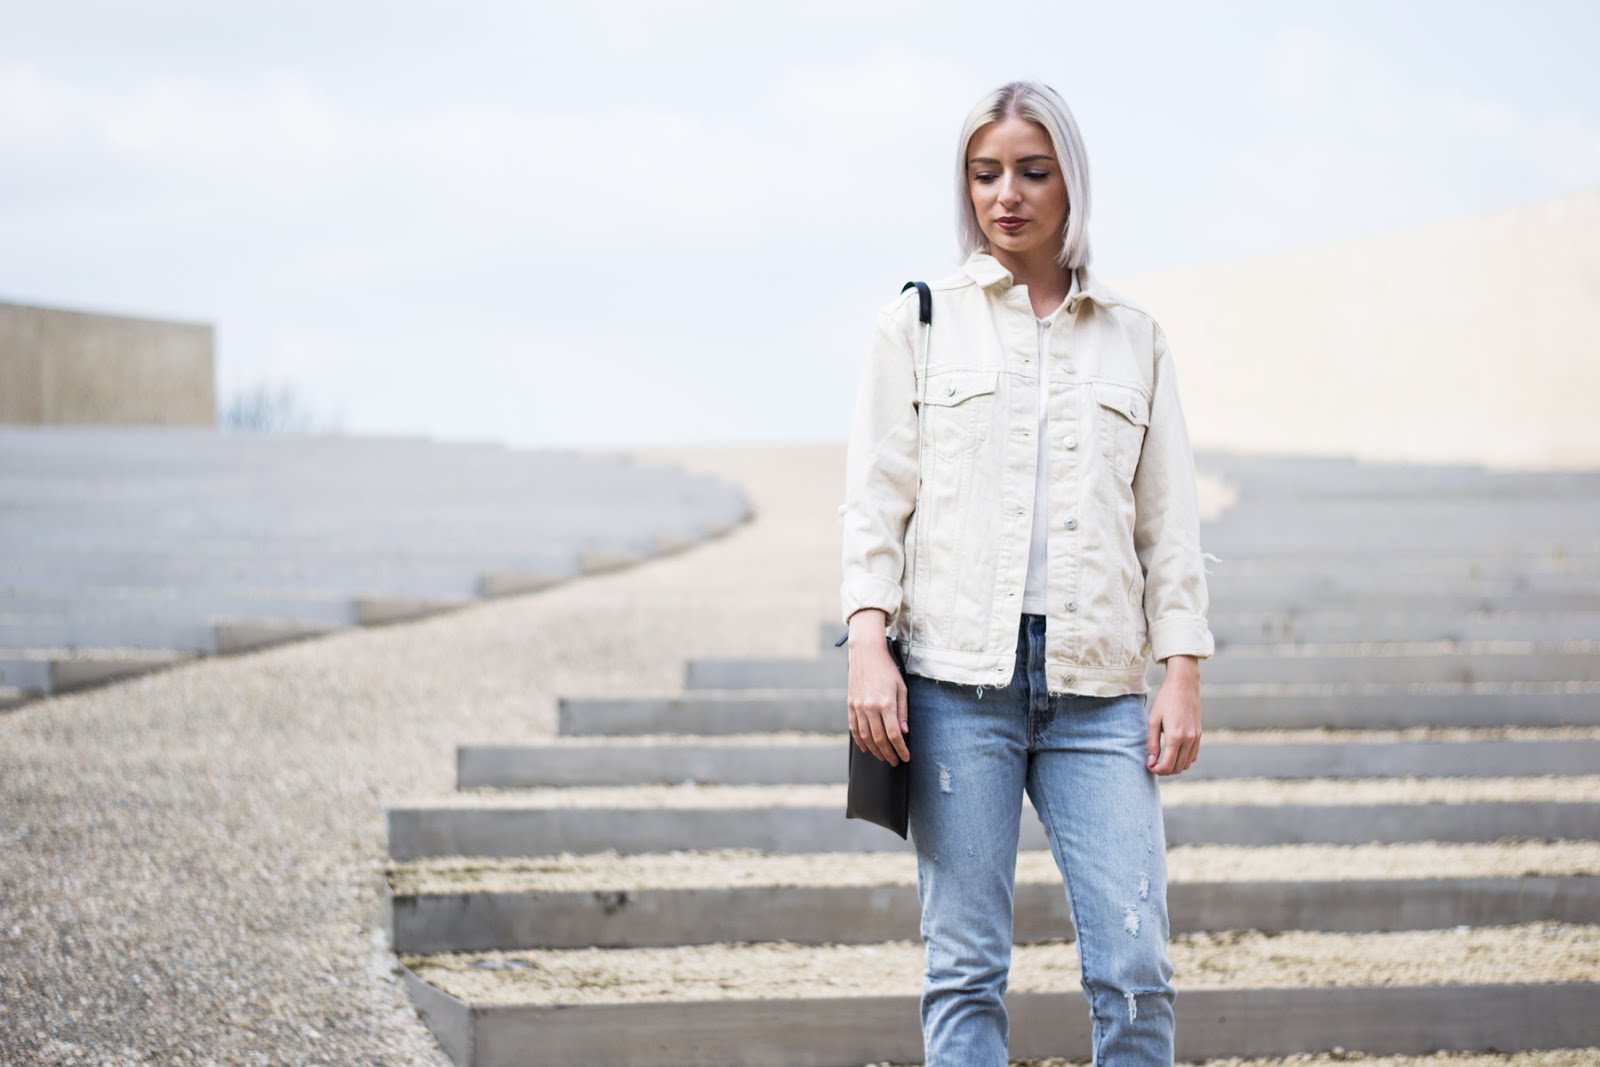 Topshop denim jacket, ecru, White polo shirt noisy may, levi's vintage 501 Skinny jeans, Flippa k bag, SS17, zalando, outfit, vroenhoven, minimal